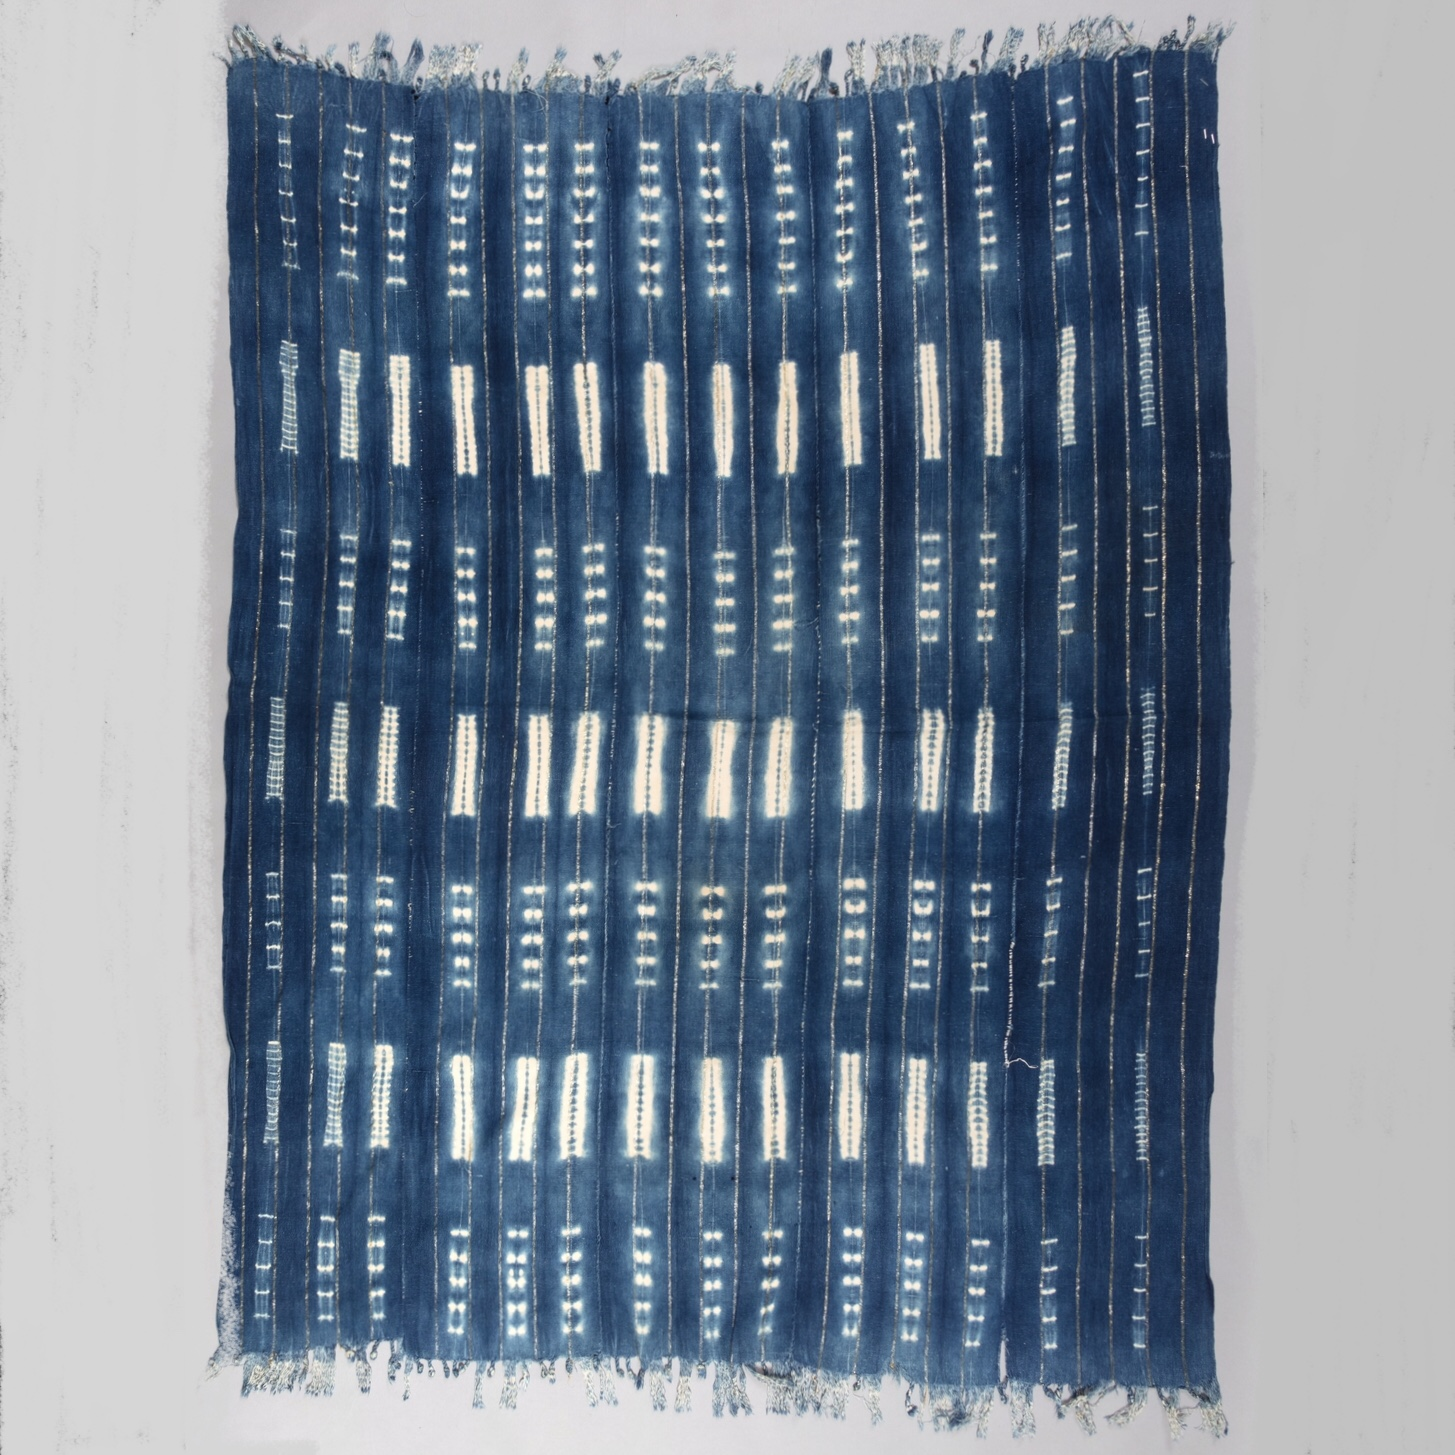 A MASTERFUL MOSSI CLOTH, BURKINA FASO ( No 3892 )